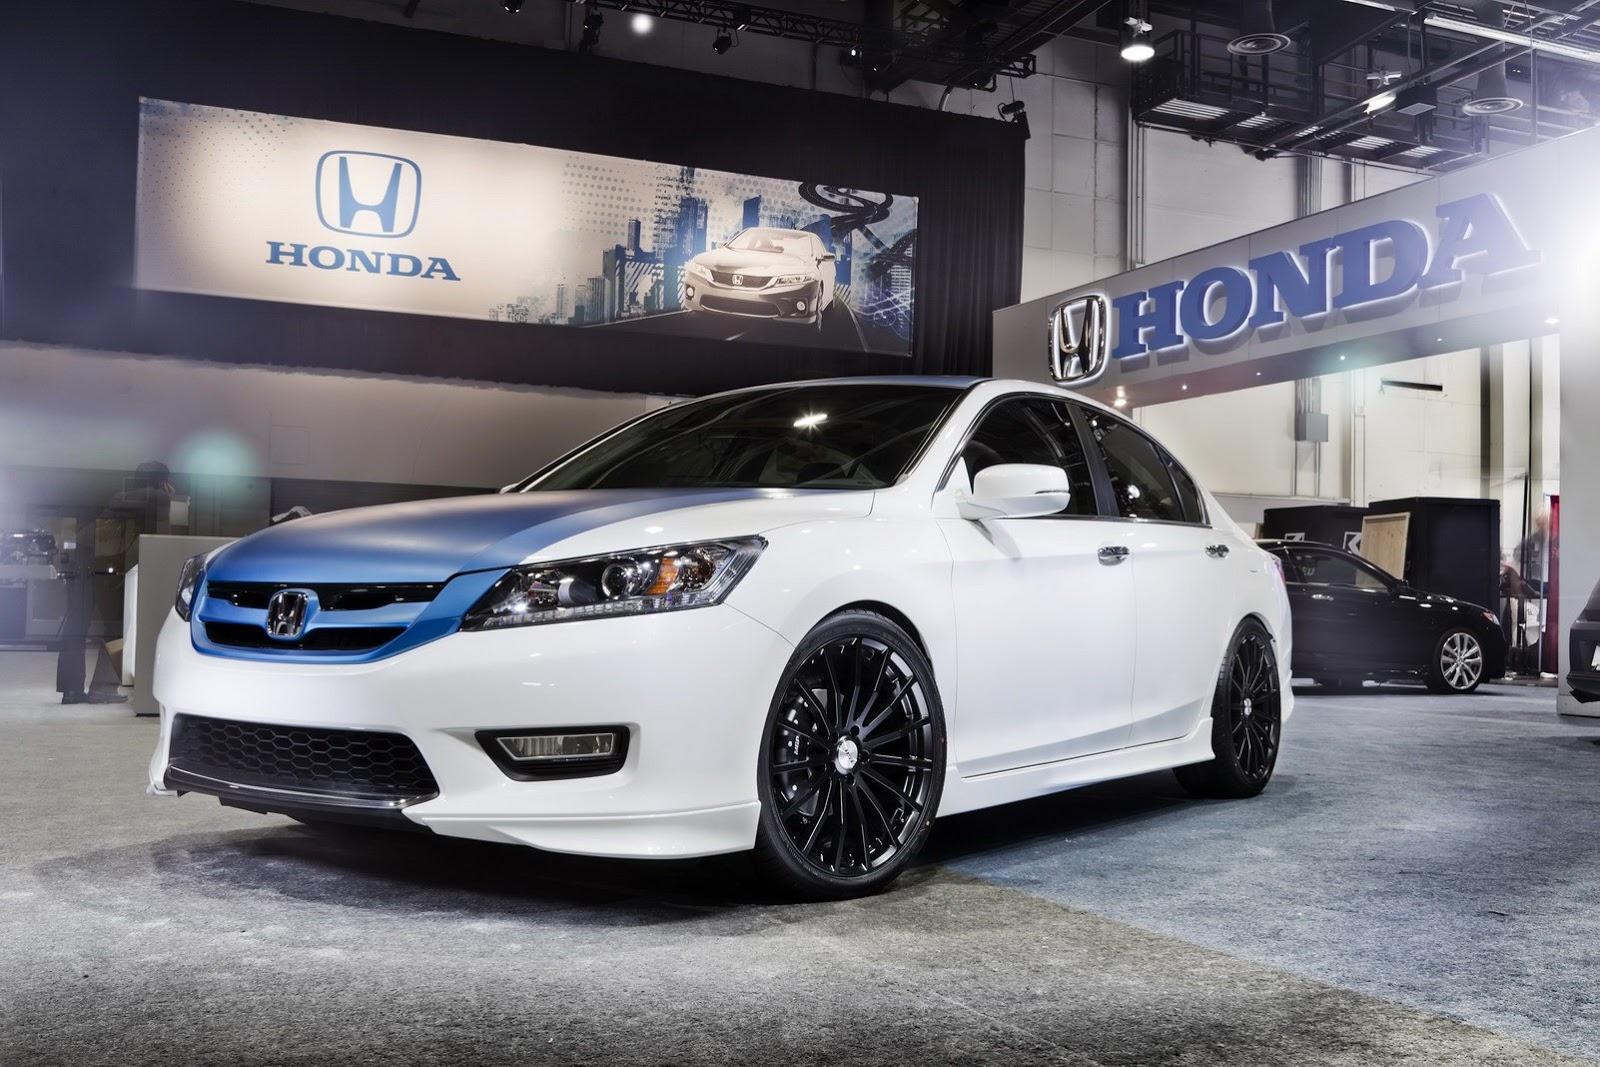 2013 Honda Accord Information And Photos Zombiedrive